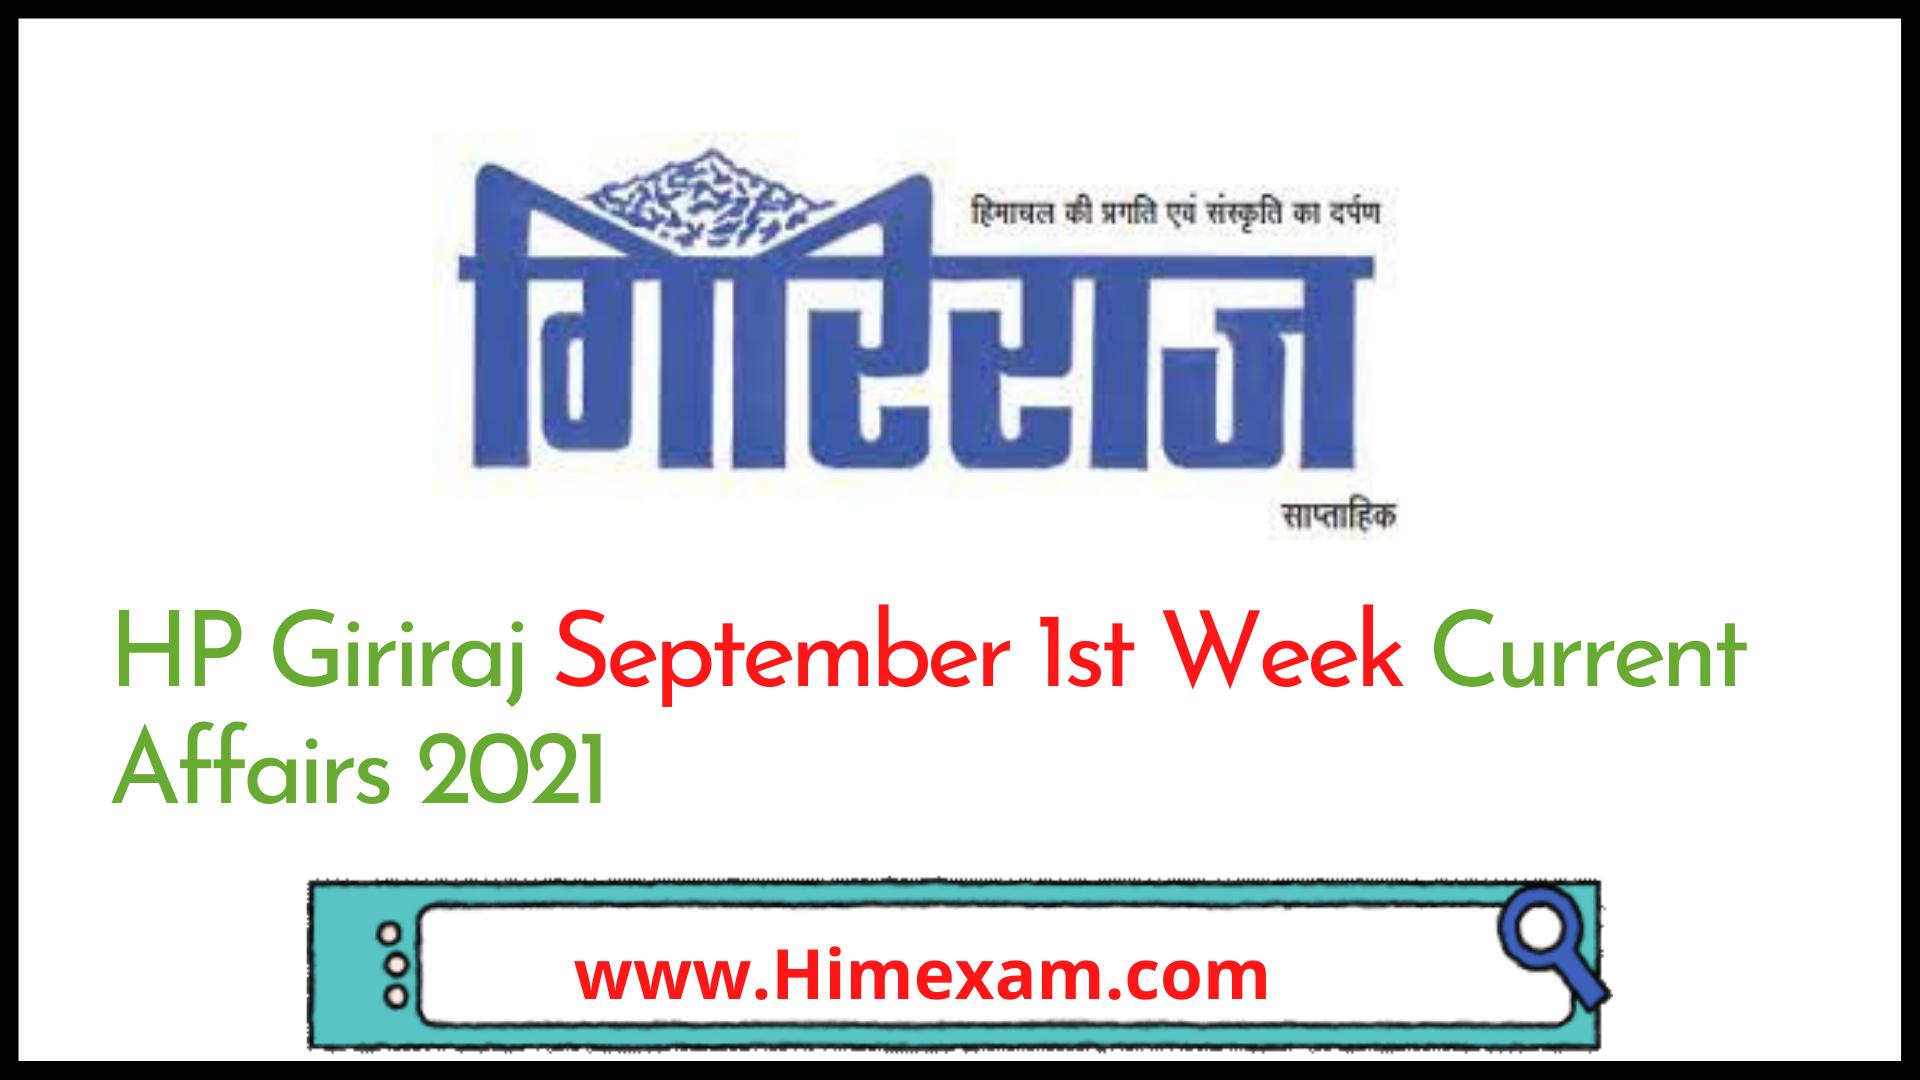 HP Giriraj September 1st  Week Current Affairs 2021